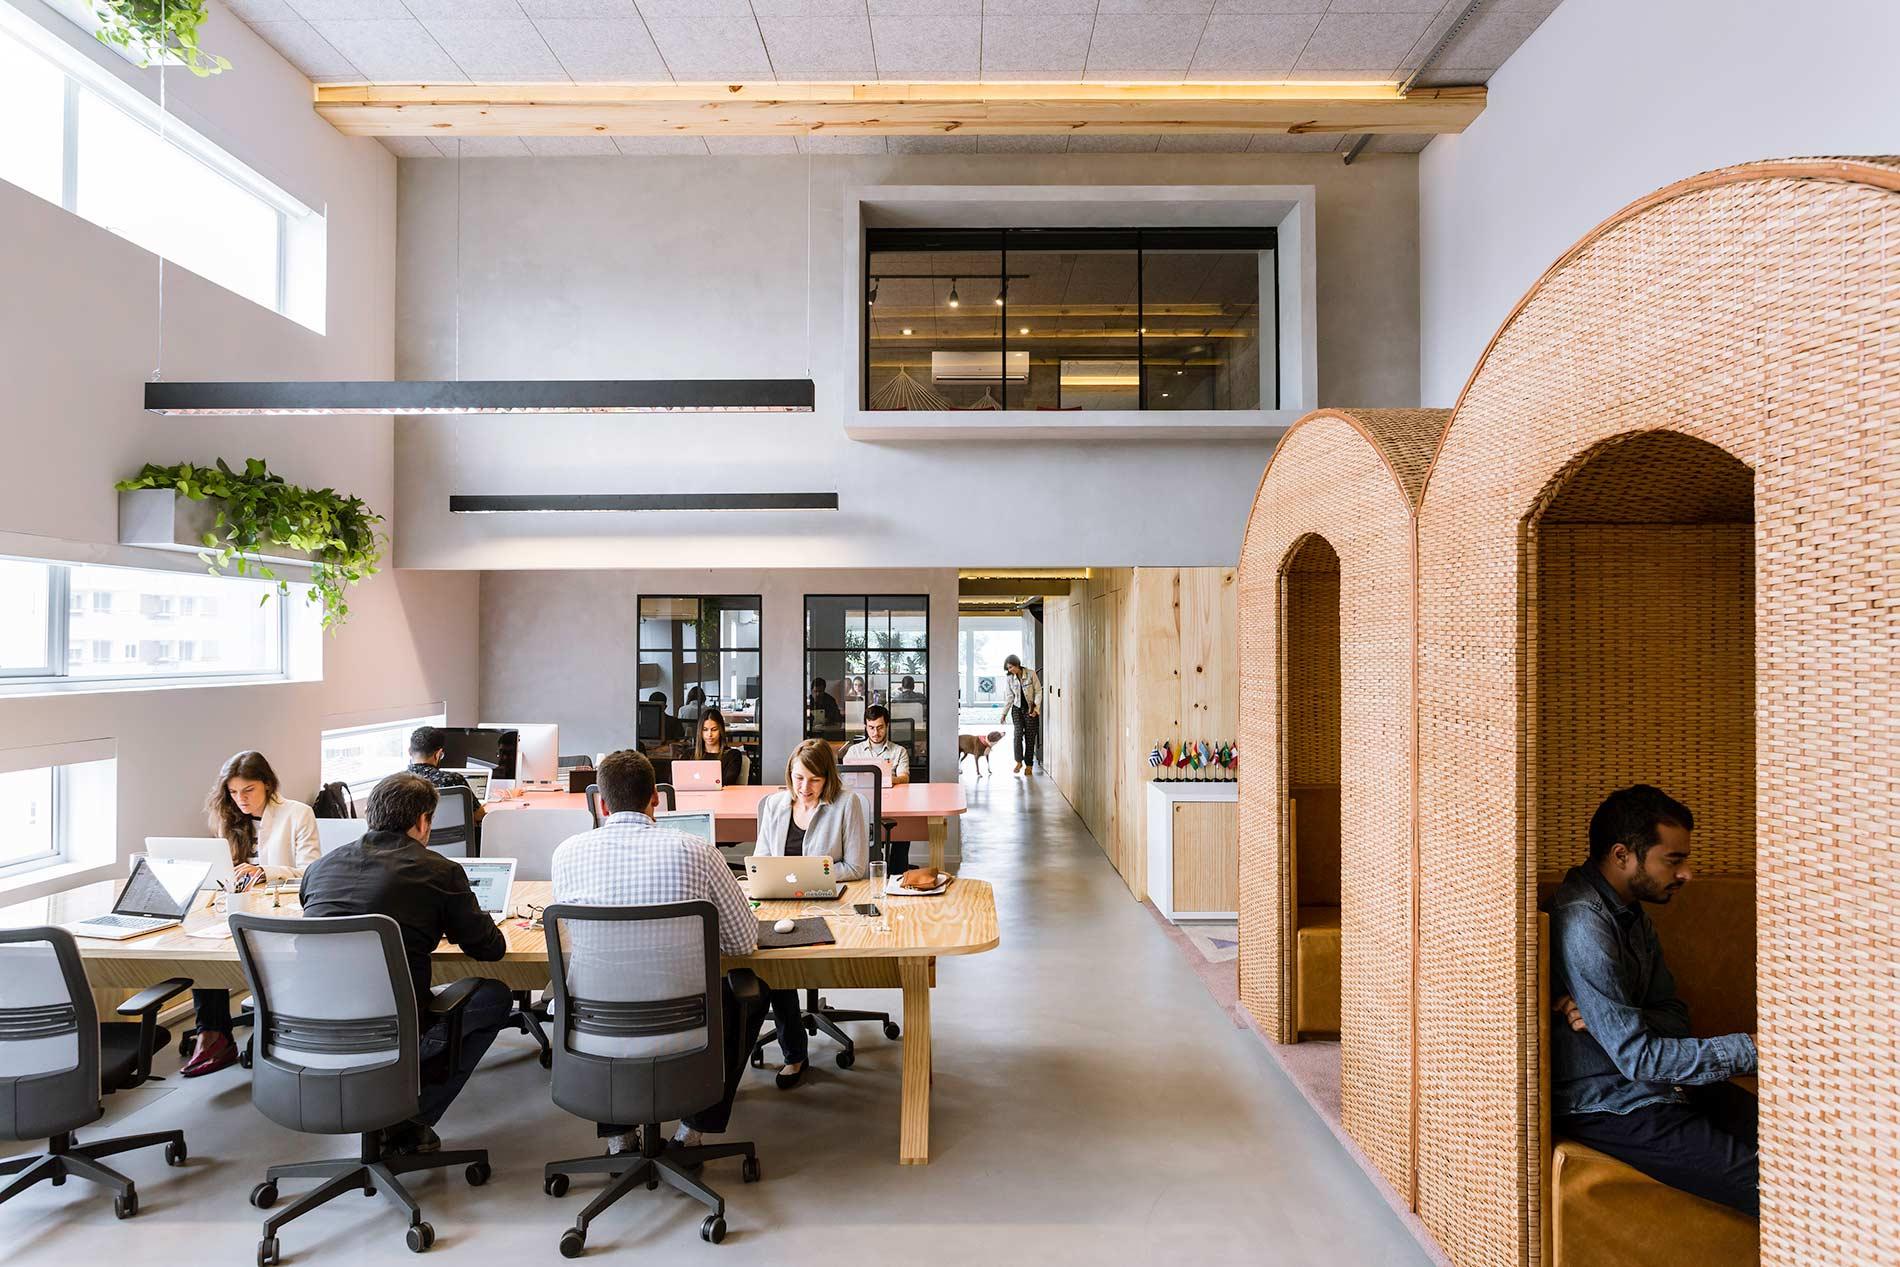 sao 5 airbnb london office design